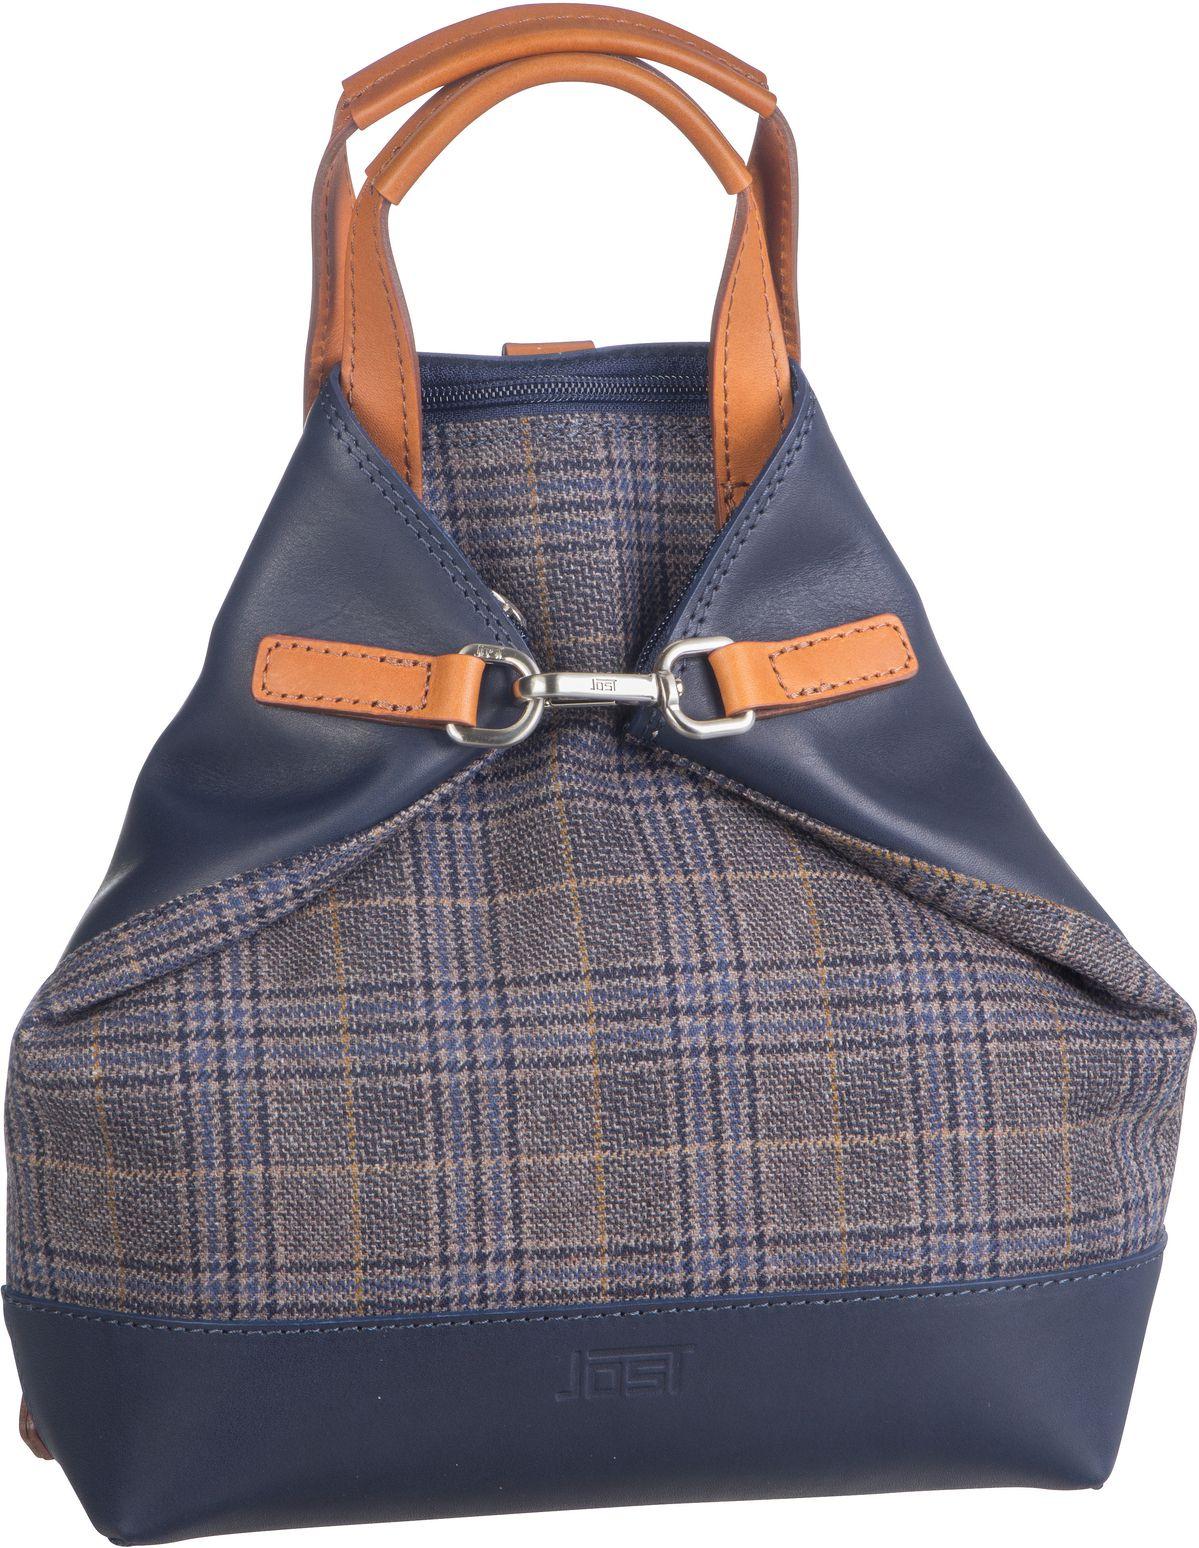 Rucksack / Daypack Checks 7233 X-Change Bag Mini Grey